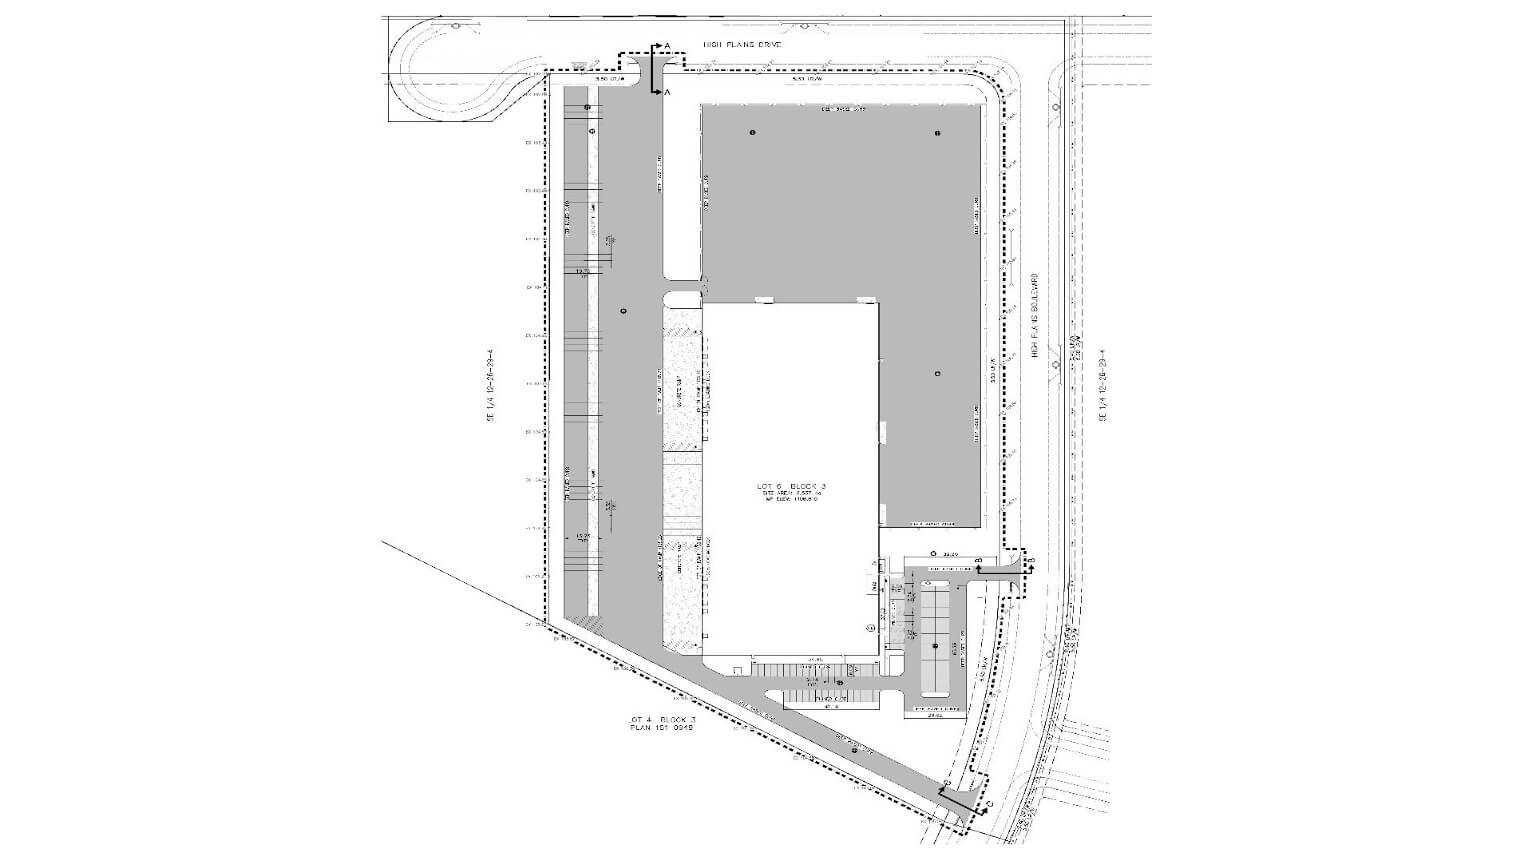 SkyDev - High Plains Drive - Site Plans